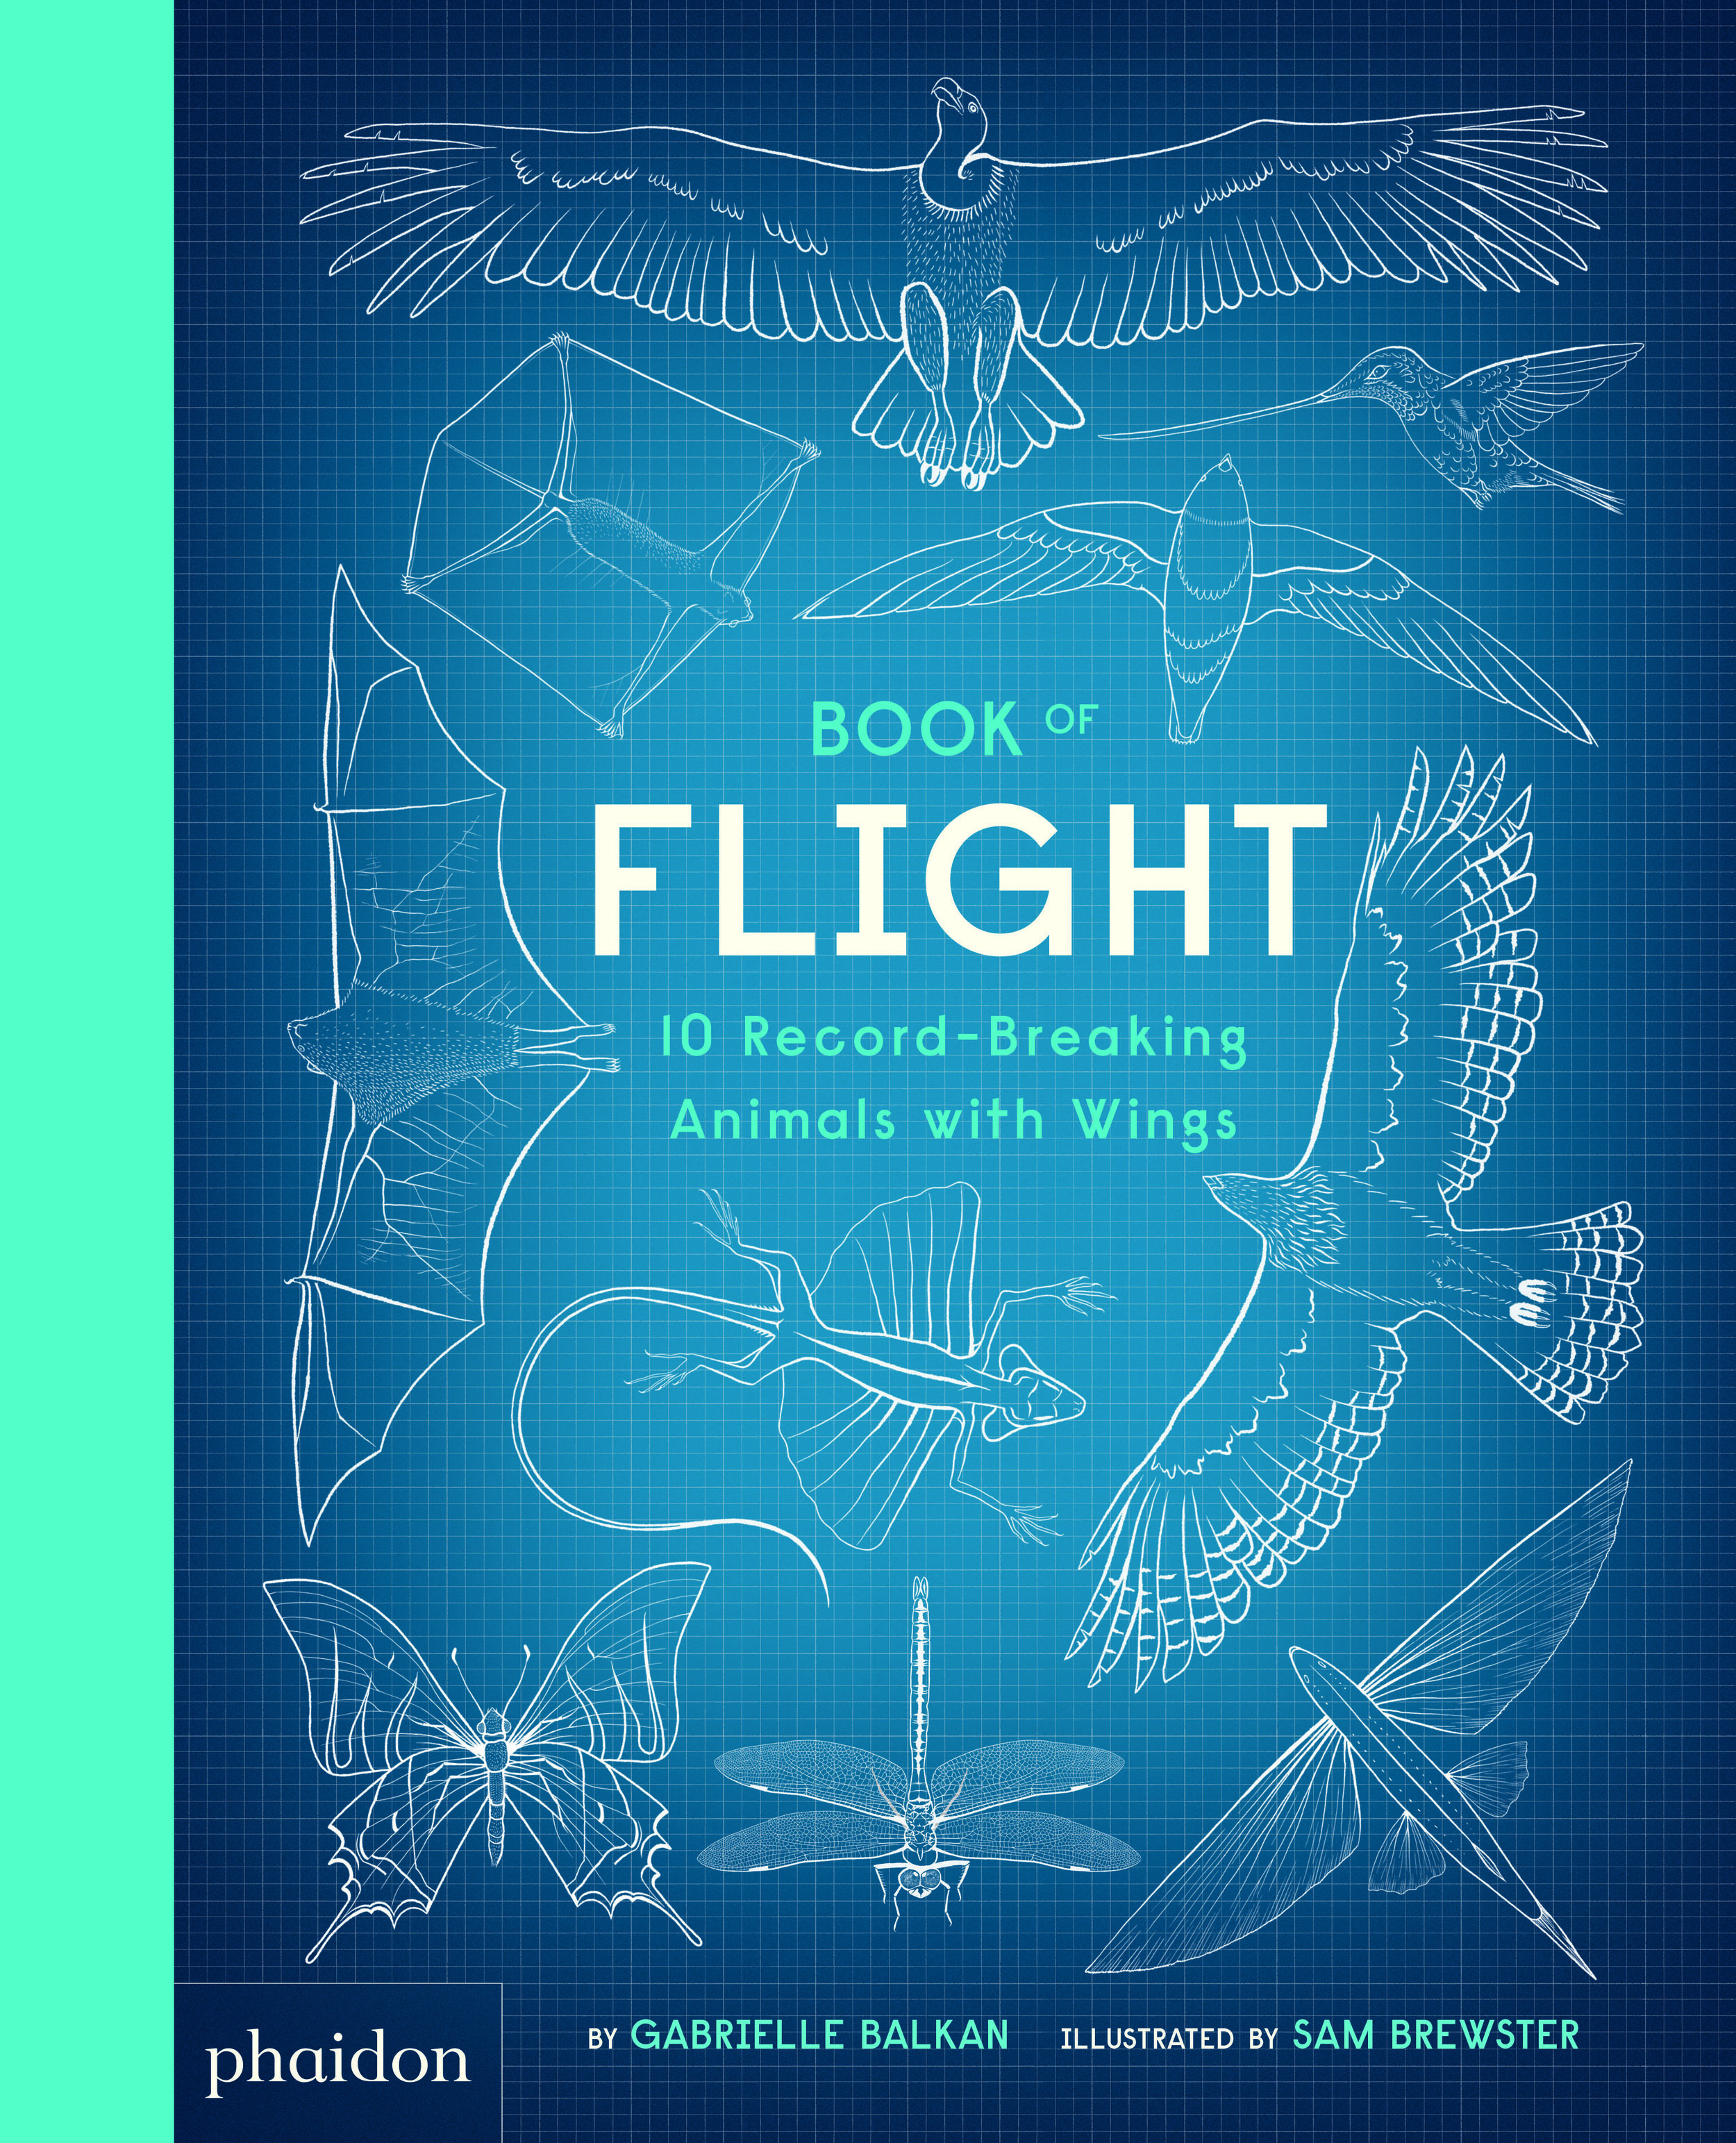 Gabrielle Balkan _Book of Flight_Cover.jpg